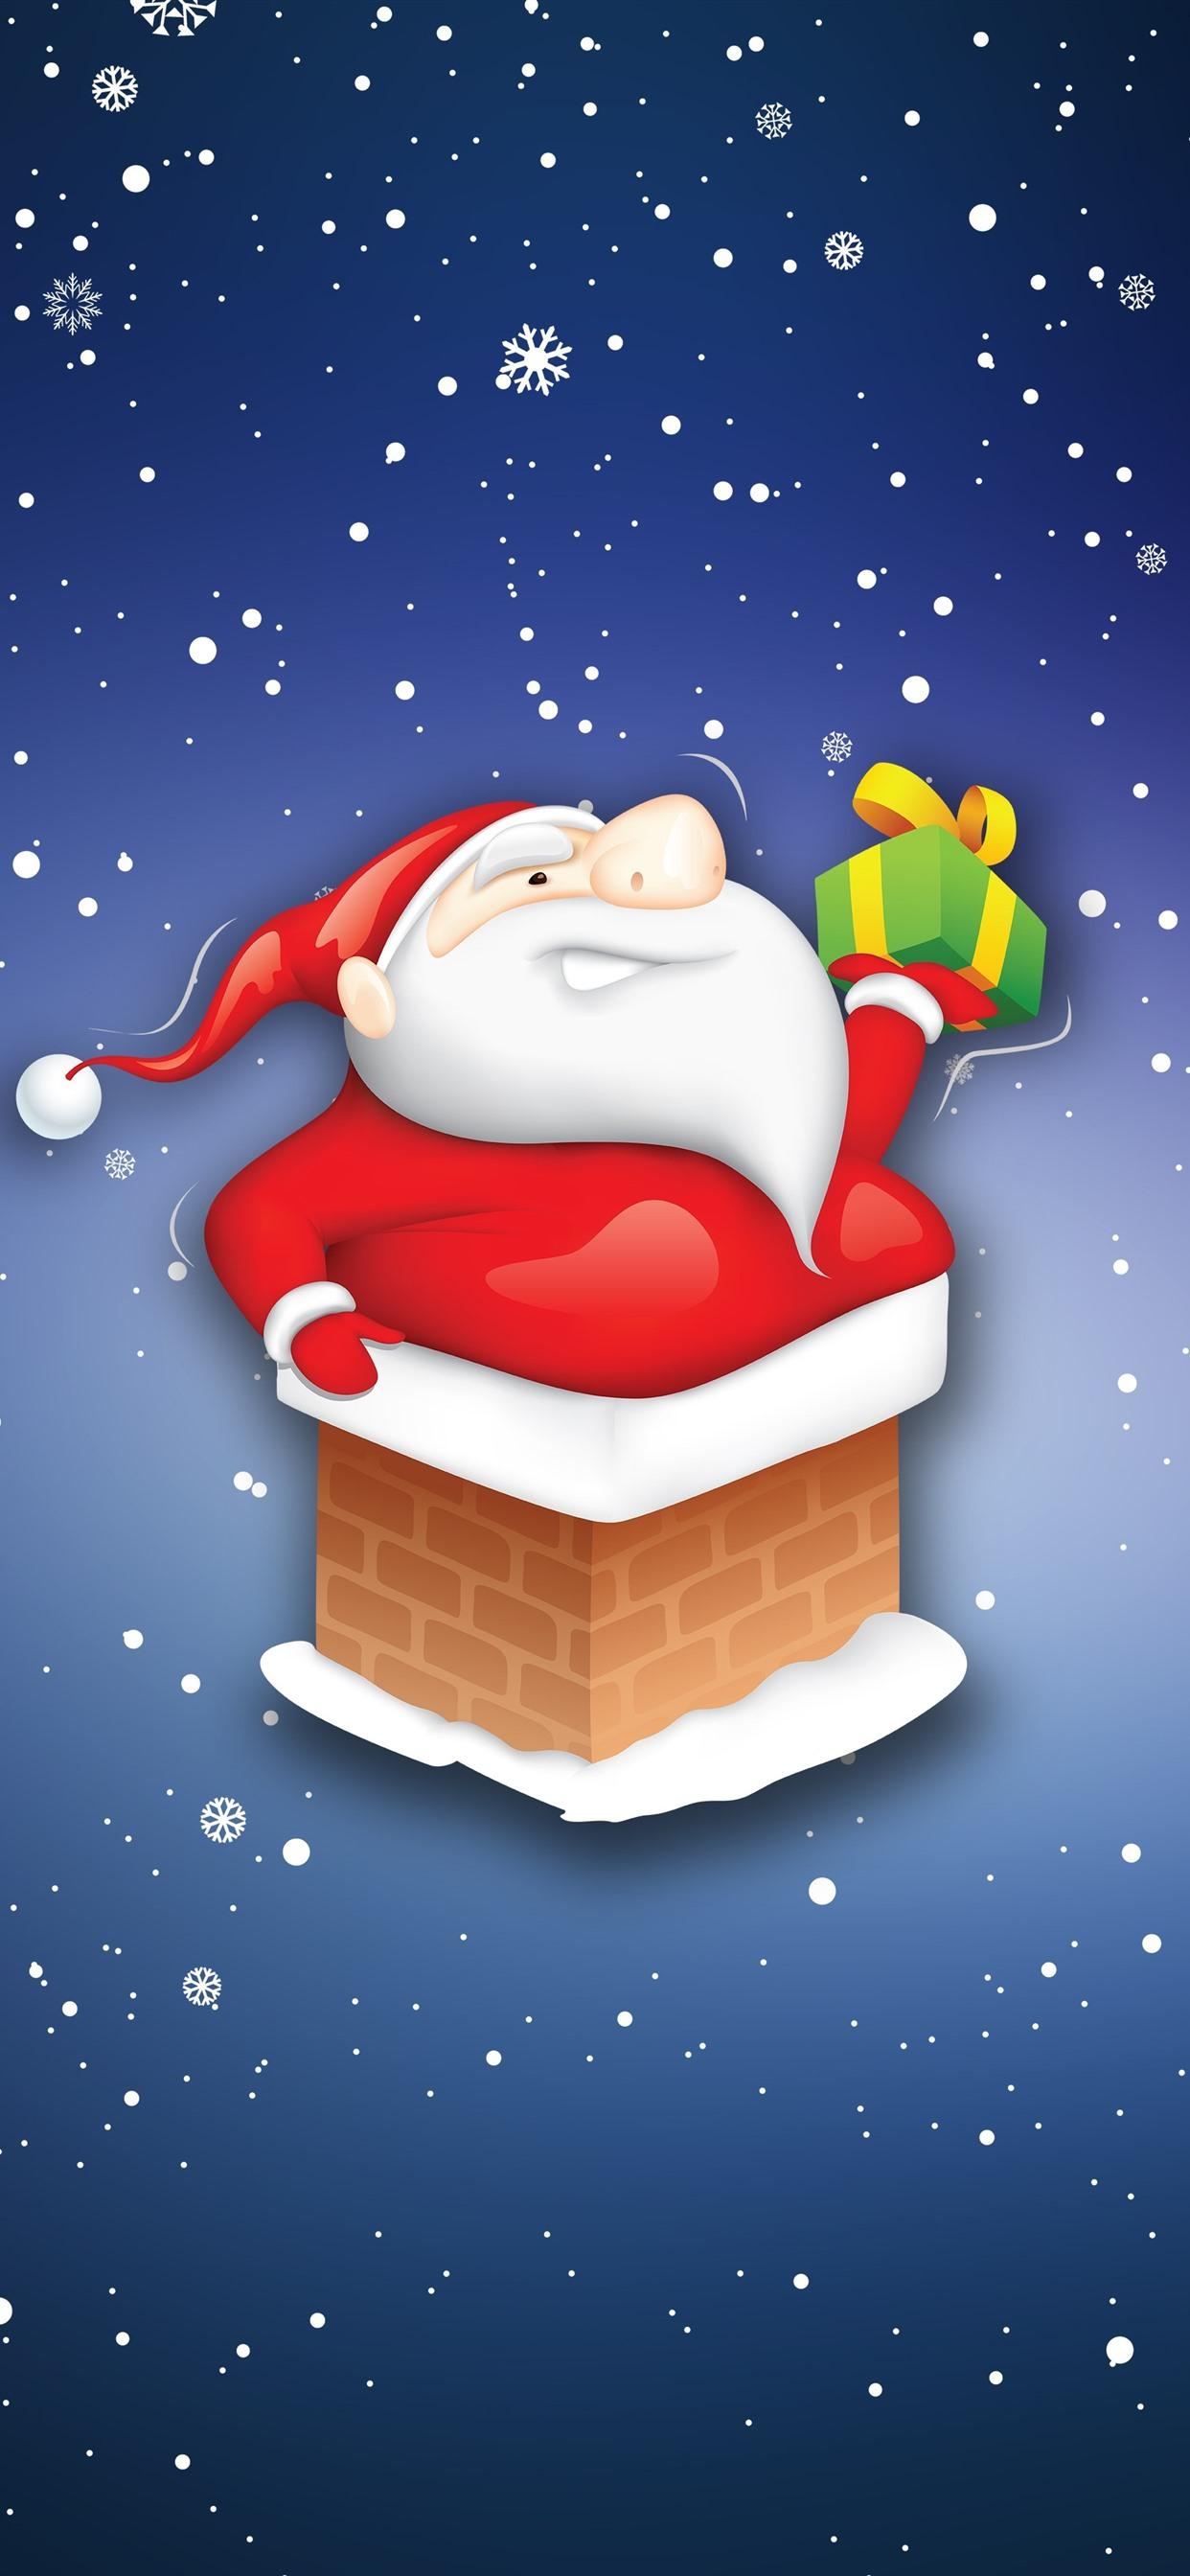 Iphone Wallpaper Santa Claus Gift Snowflakes Cartoon Christmas Santa Snow Background 2610976 Hd Wallpaper Backgrounds Download